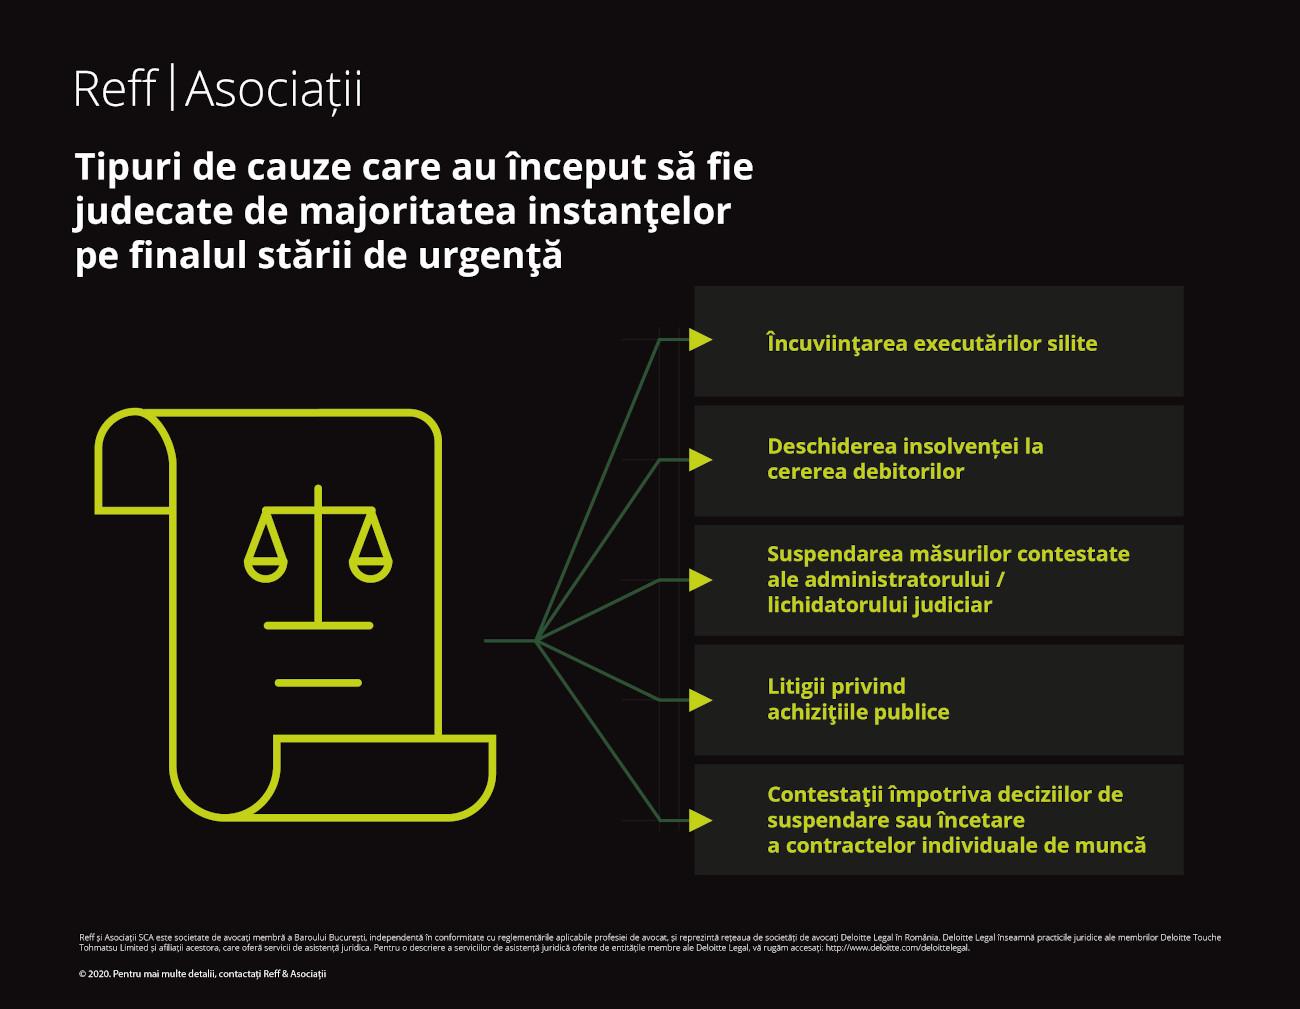 opinie Reff&Asociatii_Reluarea activitatii in justitie_infografic 02